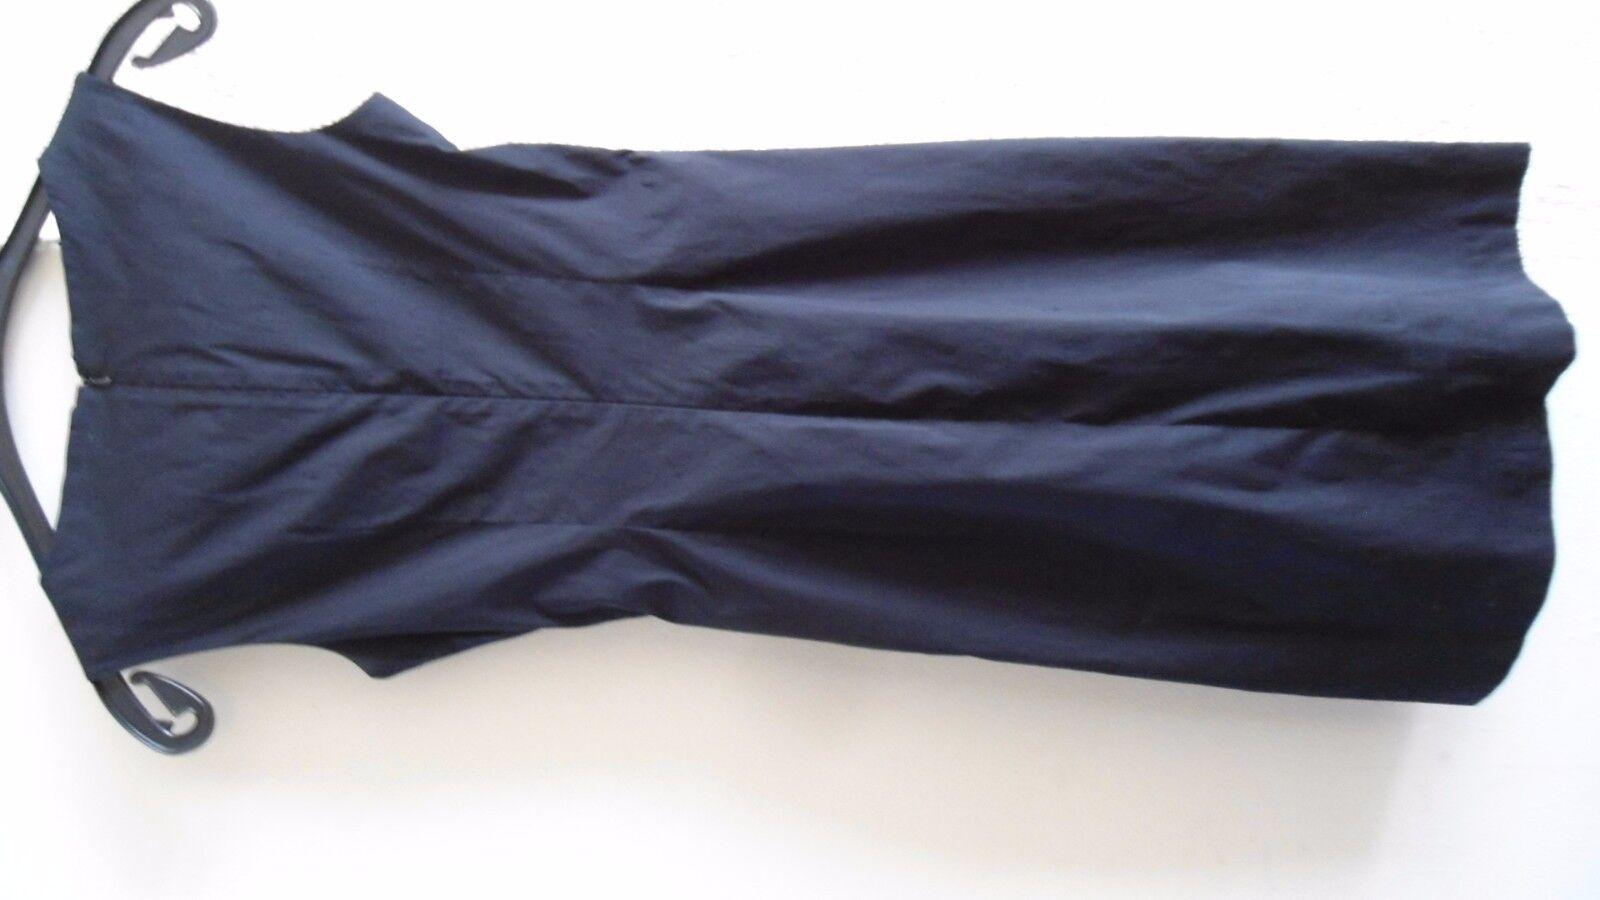 ORIGINALE Lusso Designer abito DKNY Donna Karan NERO SETA SETA SETA TG. 4 34 36 NUOVO d9df1d